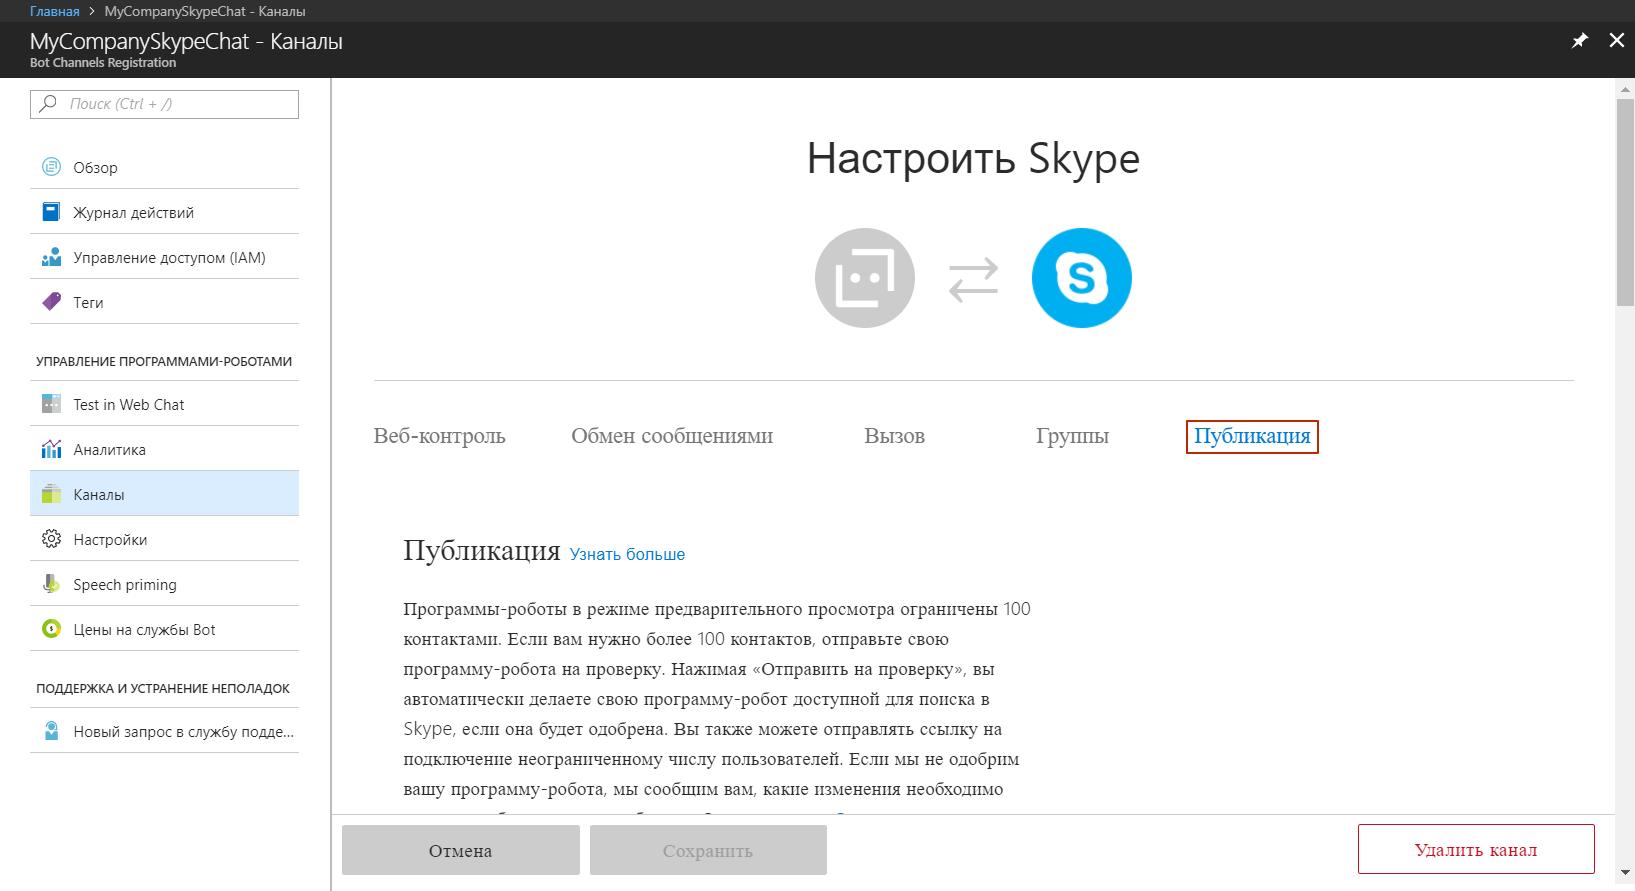 files.php?filename=58e1507b0de8c37eae4af